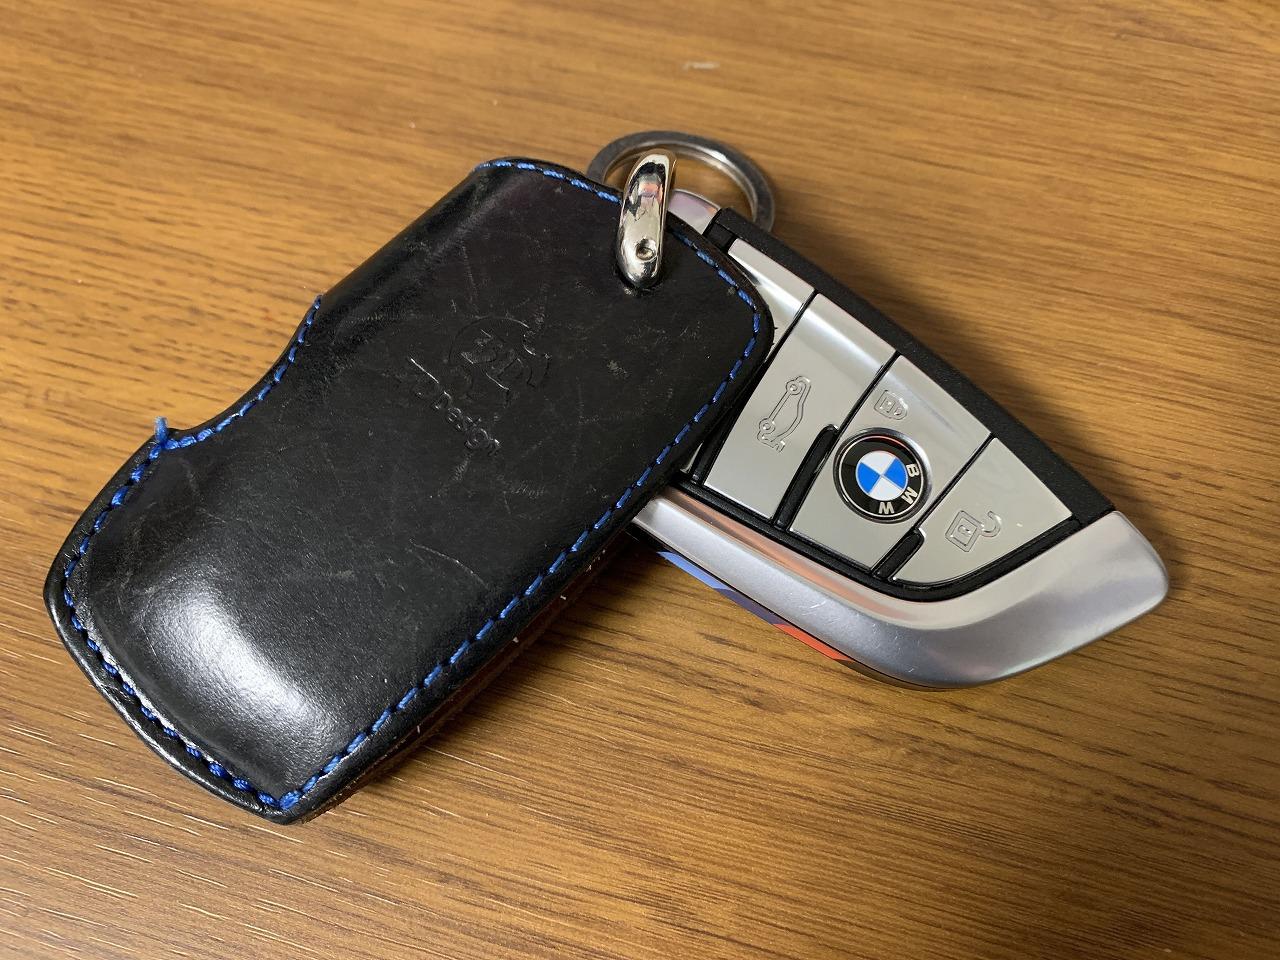 BMW5シリーズ(G31)のリモコンキーケースは「3D Designキーケース」を引き継ぎました^^